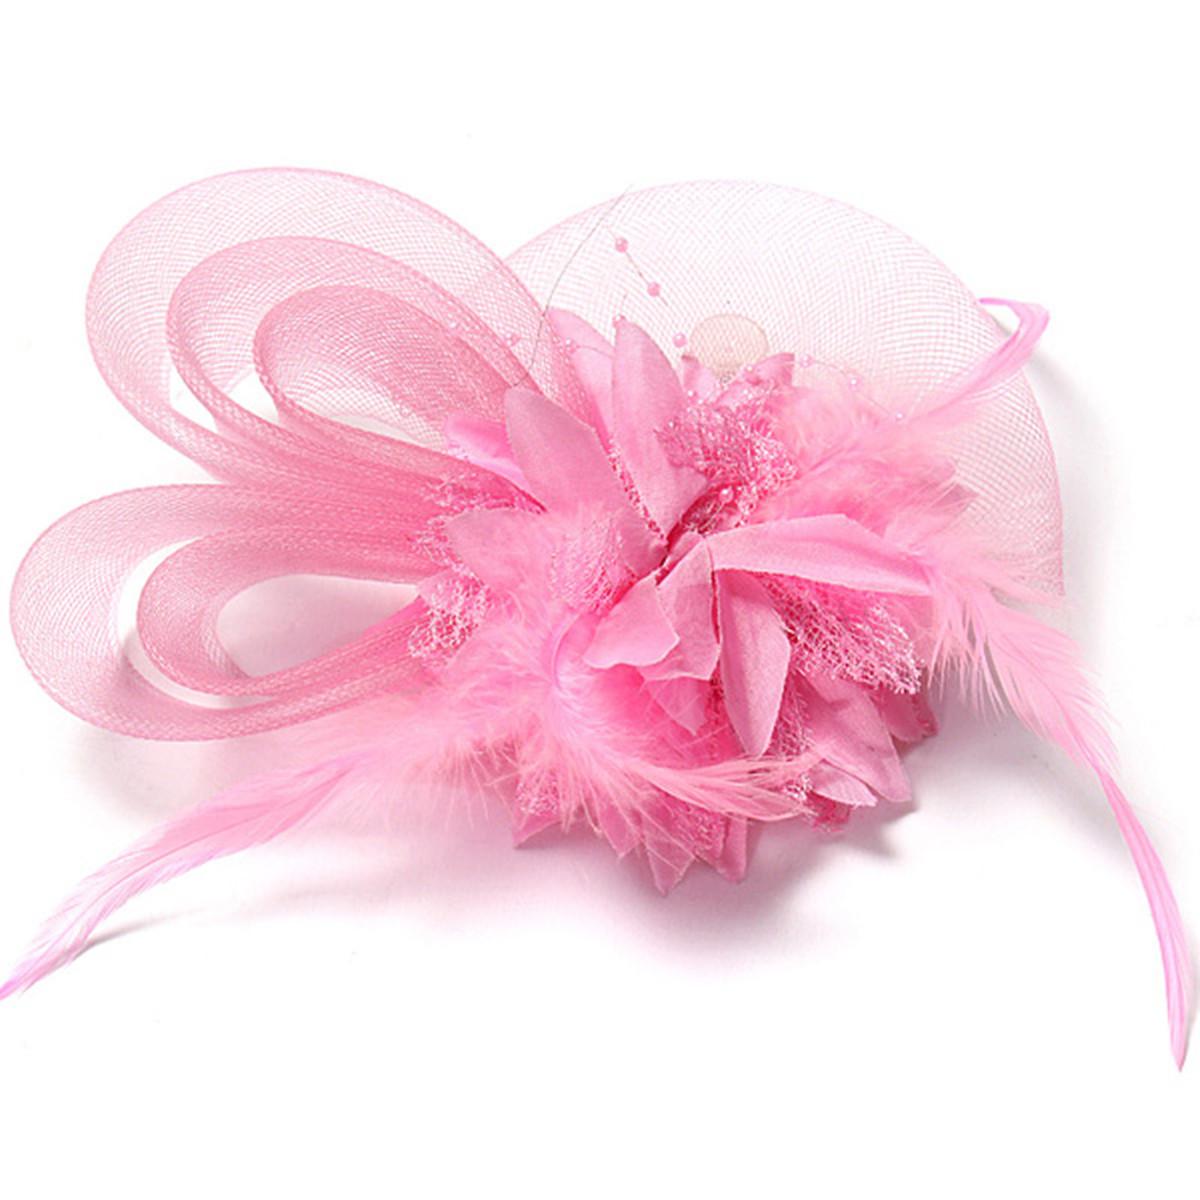 Buy Bridal Wedding Sweet Small Flower Feather Headdress ...